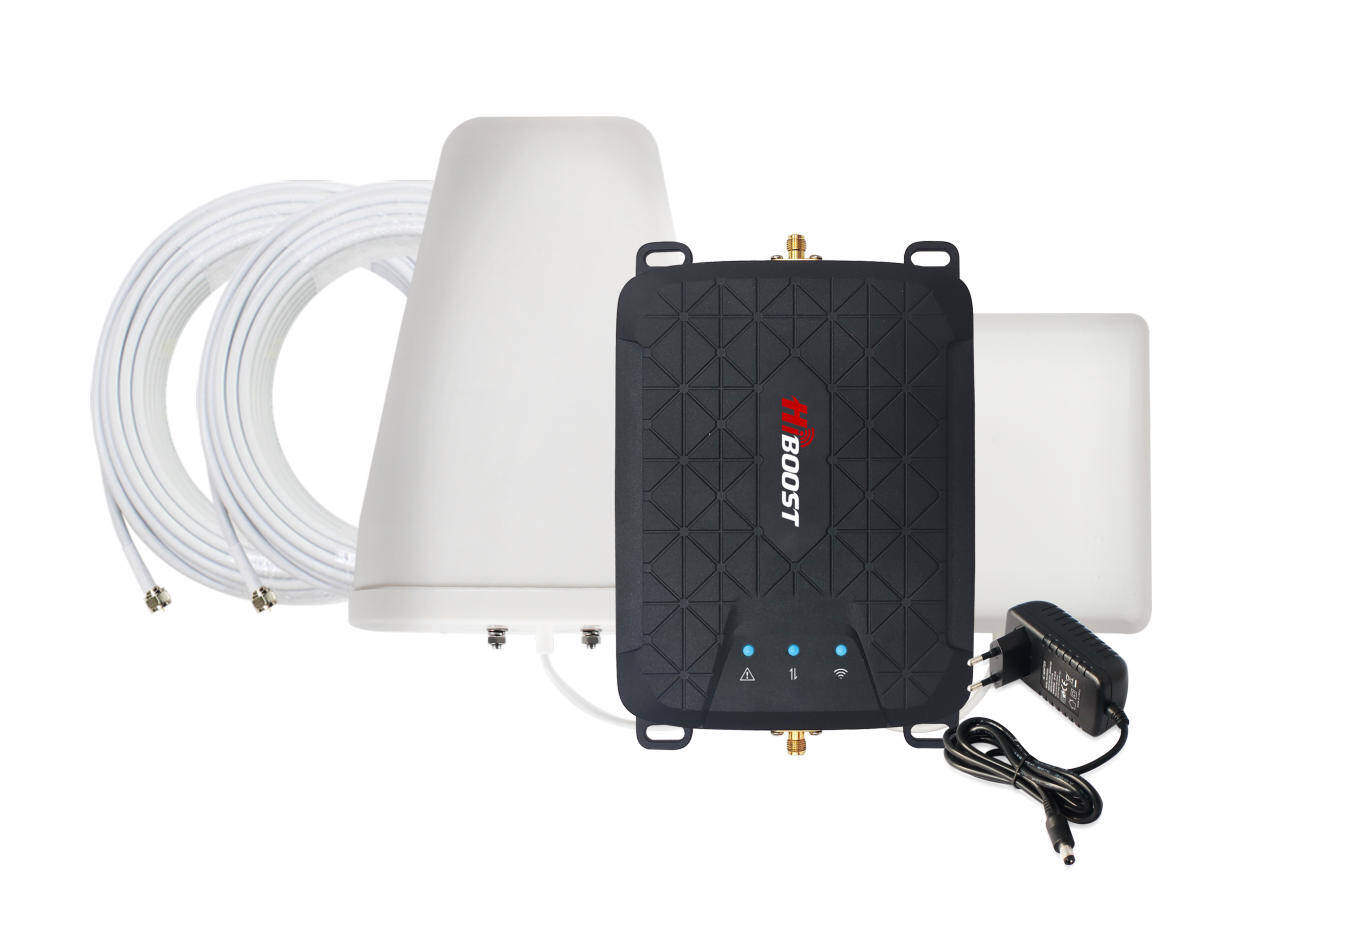 Signaal versterker met 2G,3G en 4G tot 250m2 €599,-